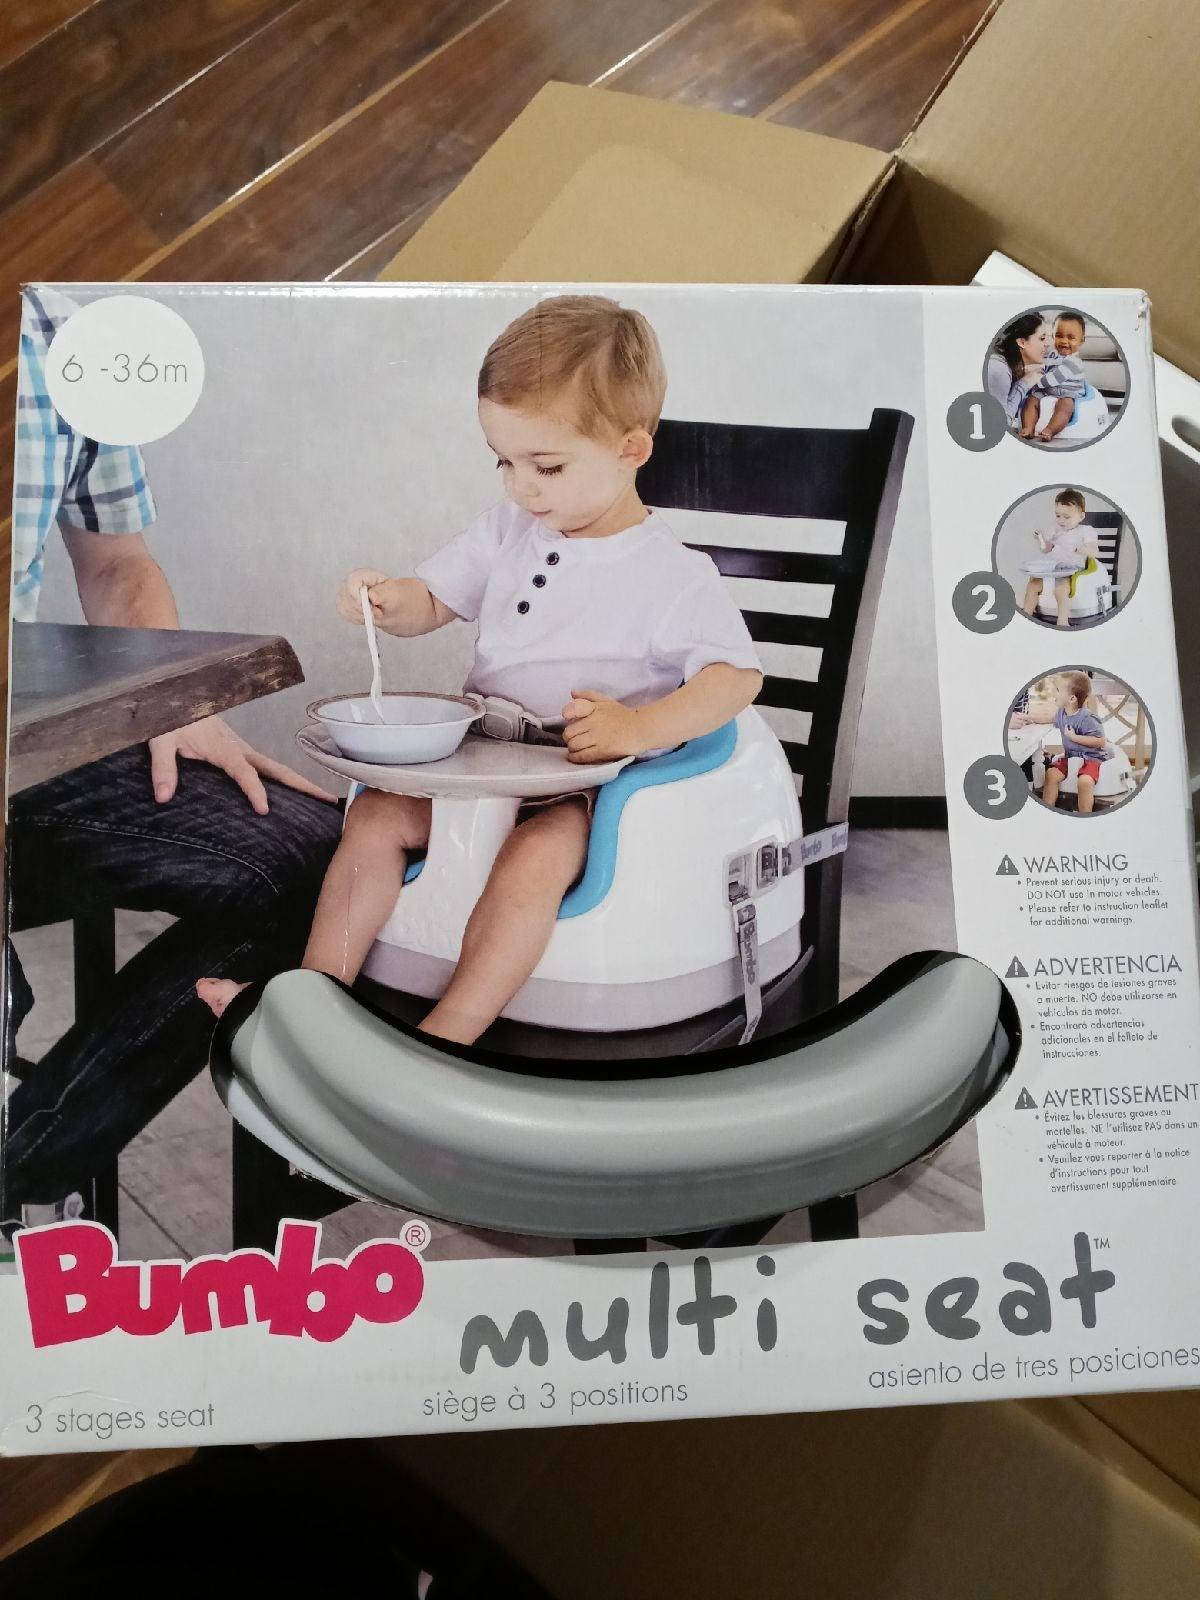 NEW Bumbo 3-in-1 multi seat tray